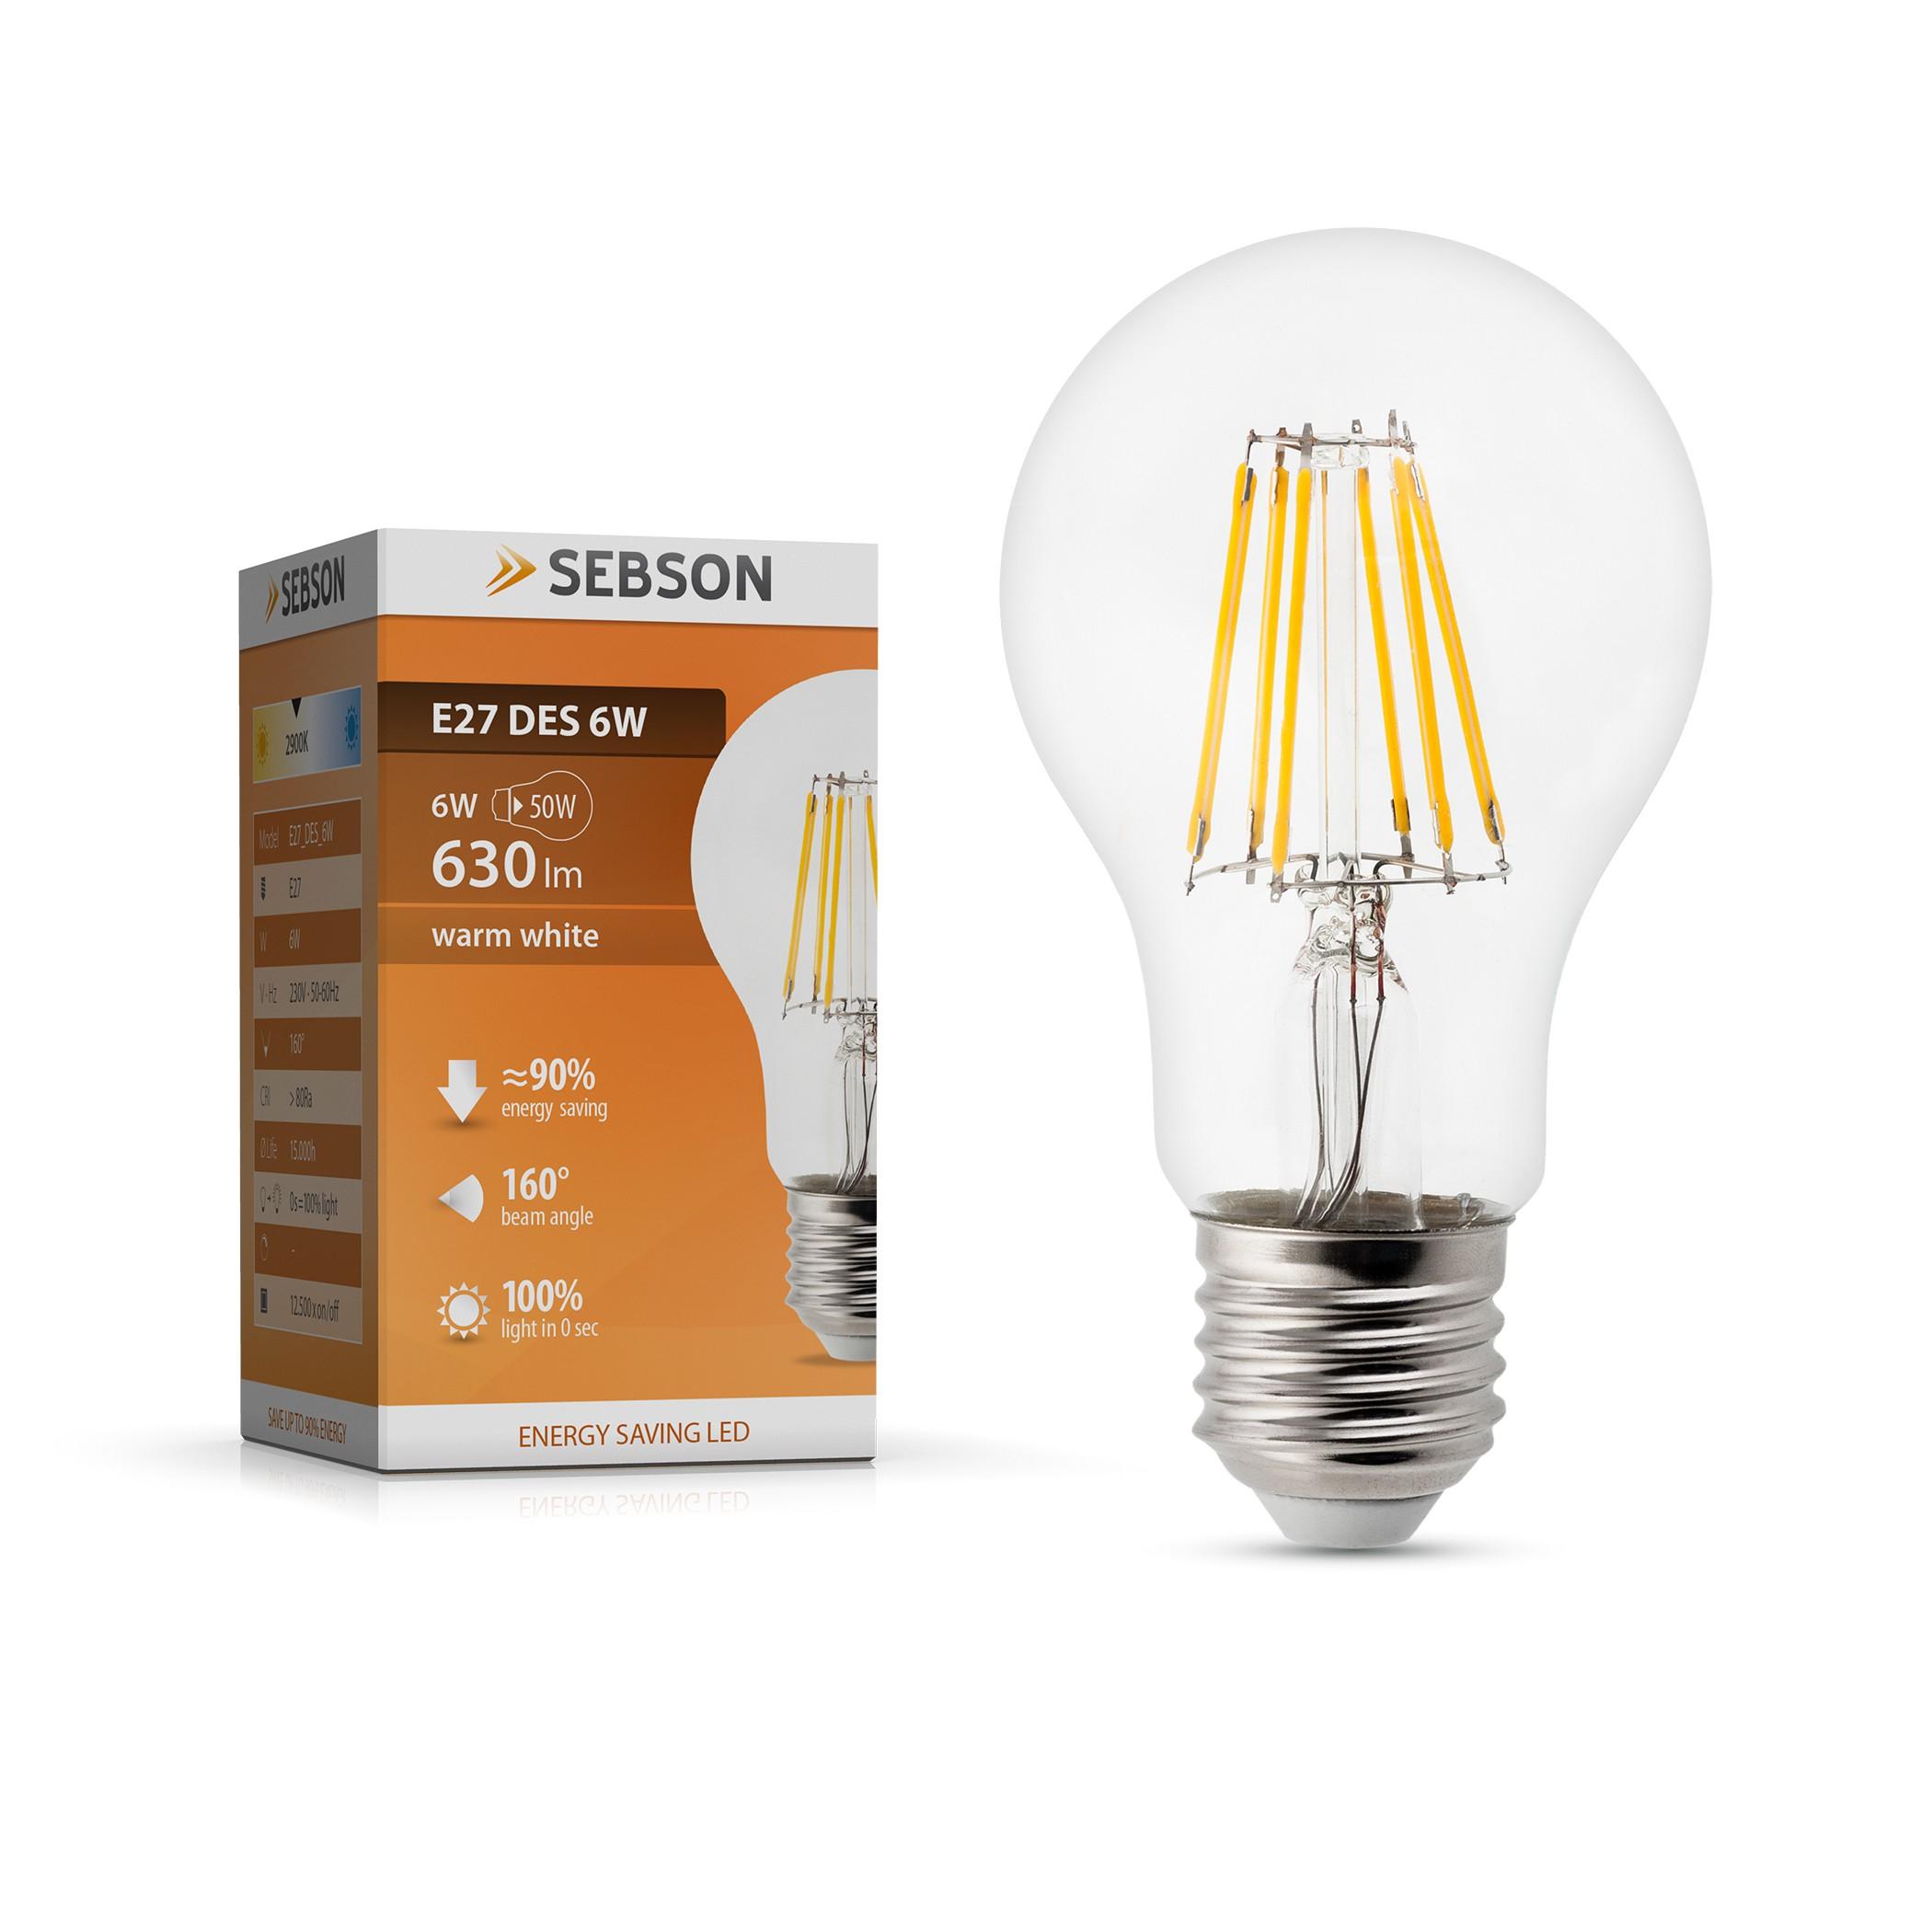 LED Fadenlampe E27 DES 6W